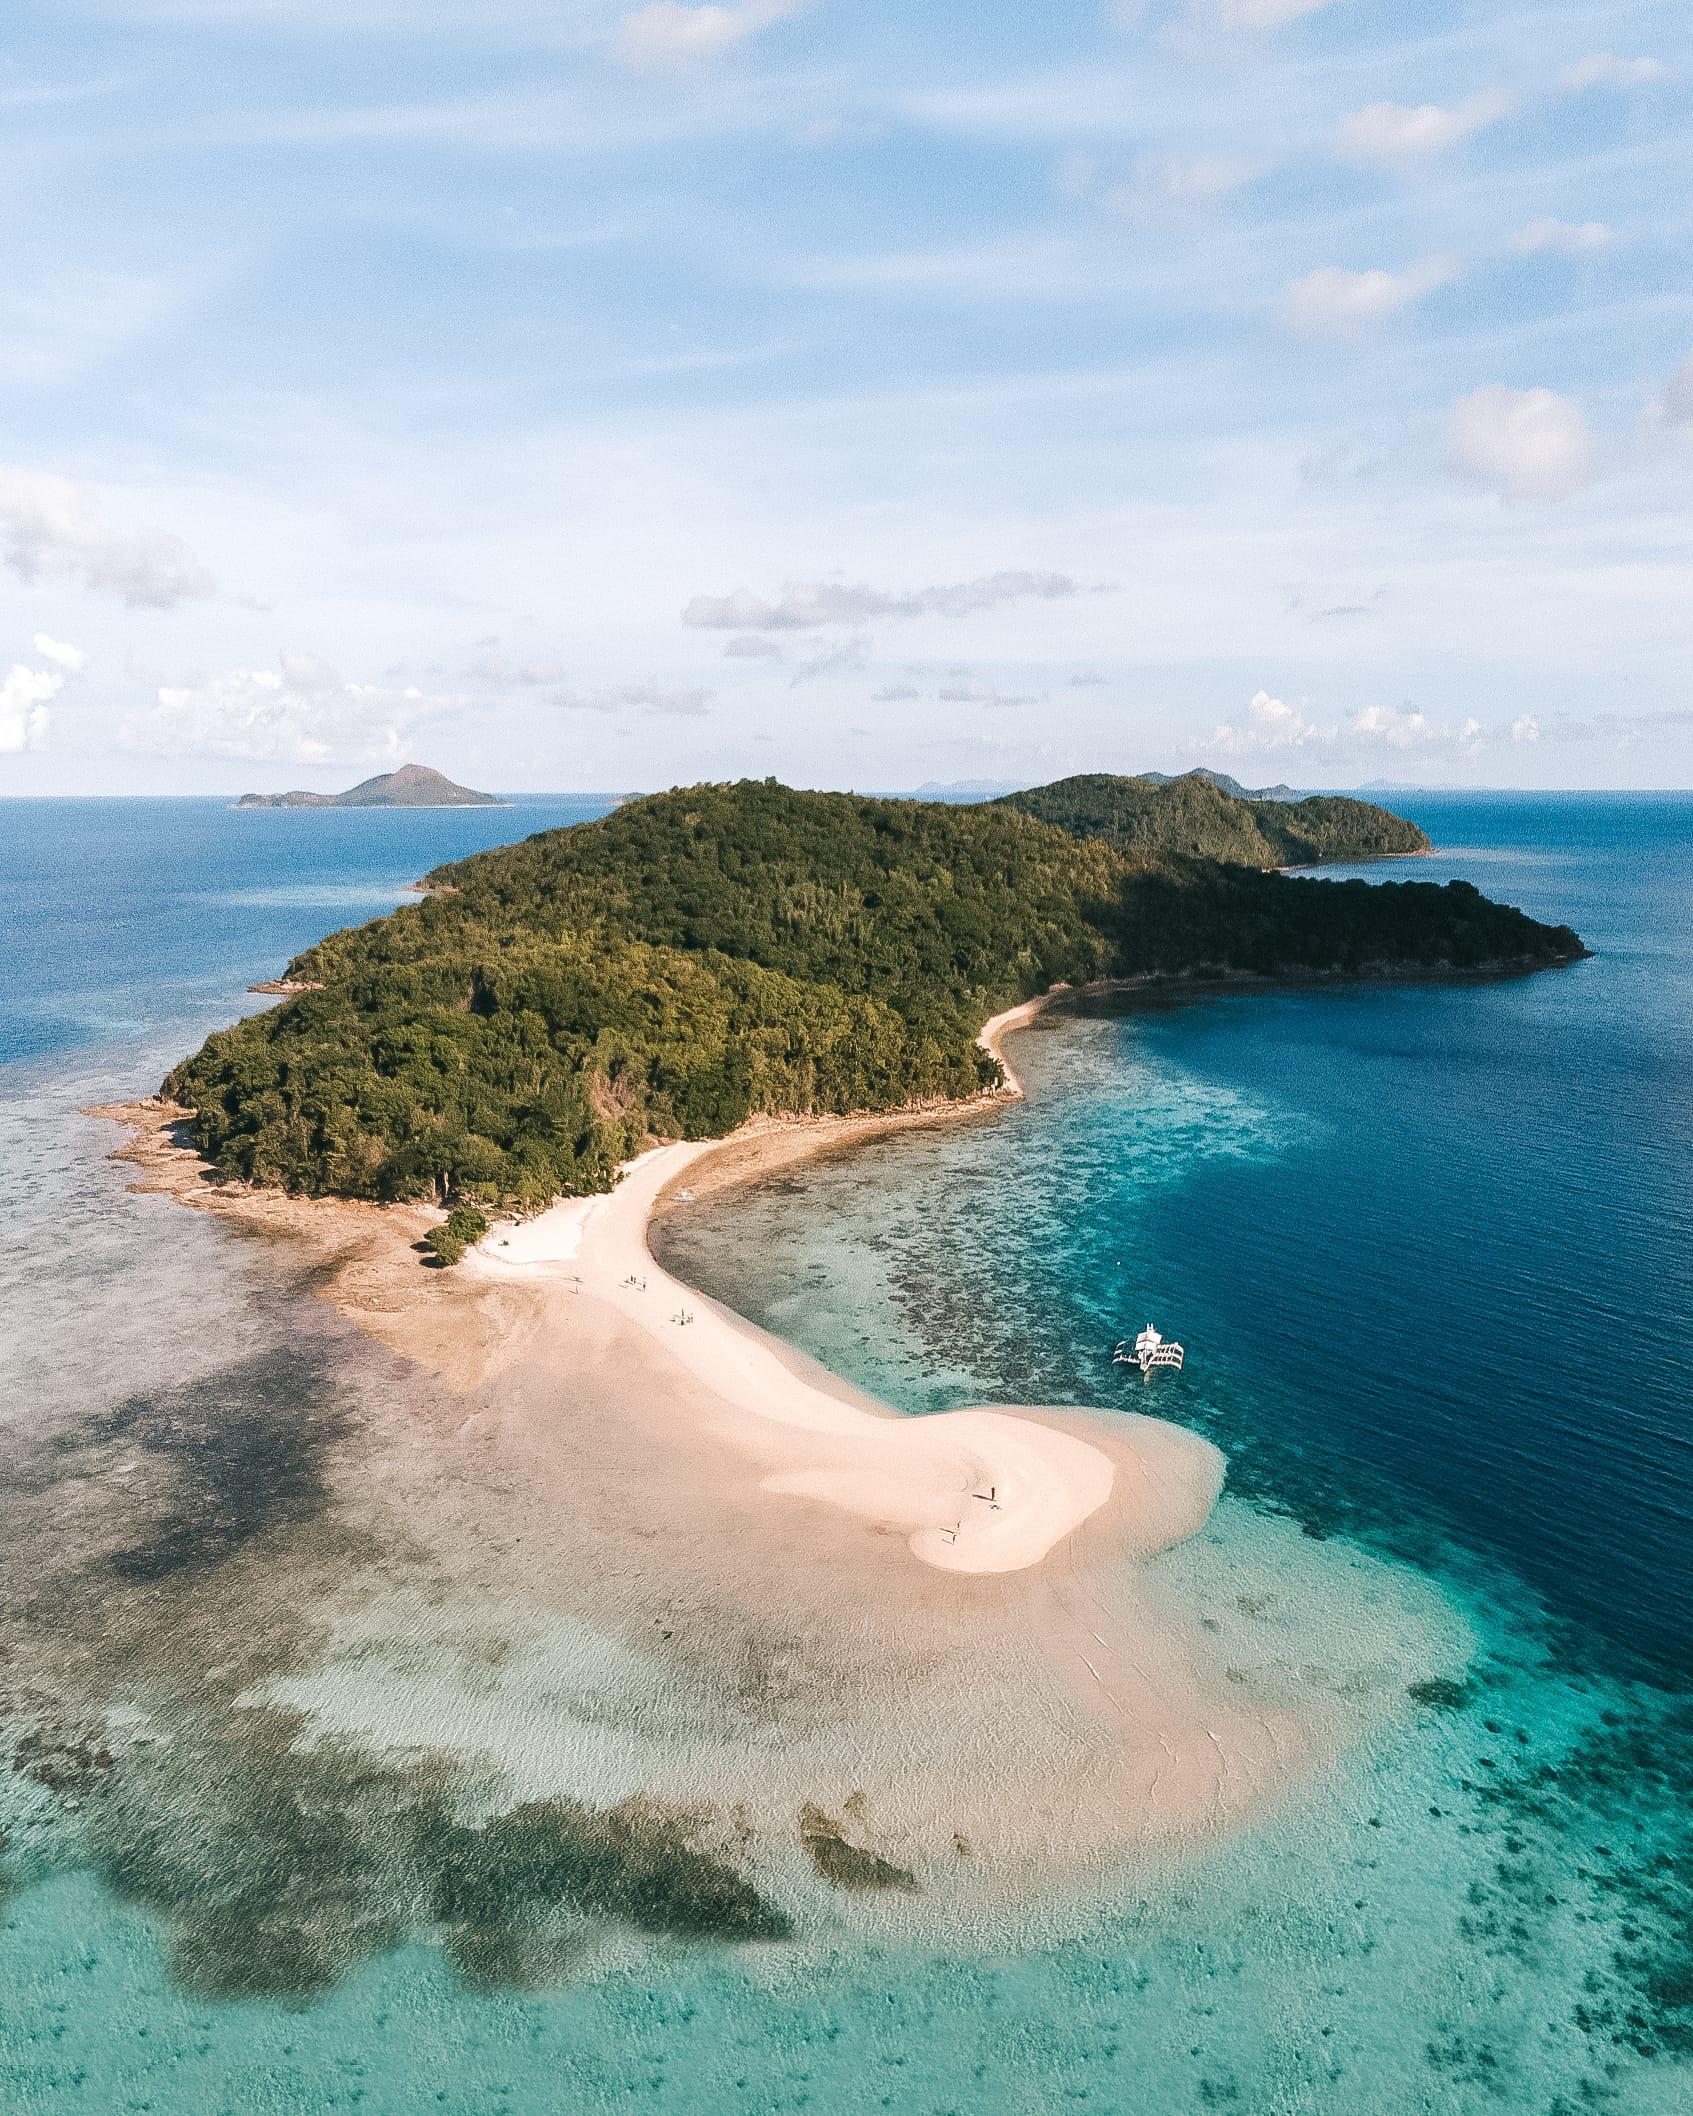 Palawan itinerary, Coron, Ditatayan Island, Coron tourist spots, Coron travel guide